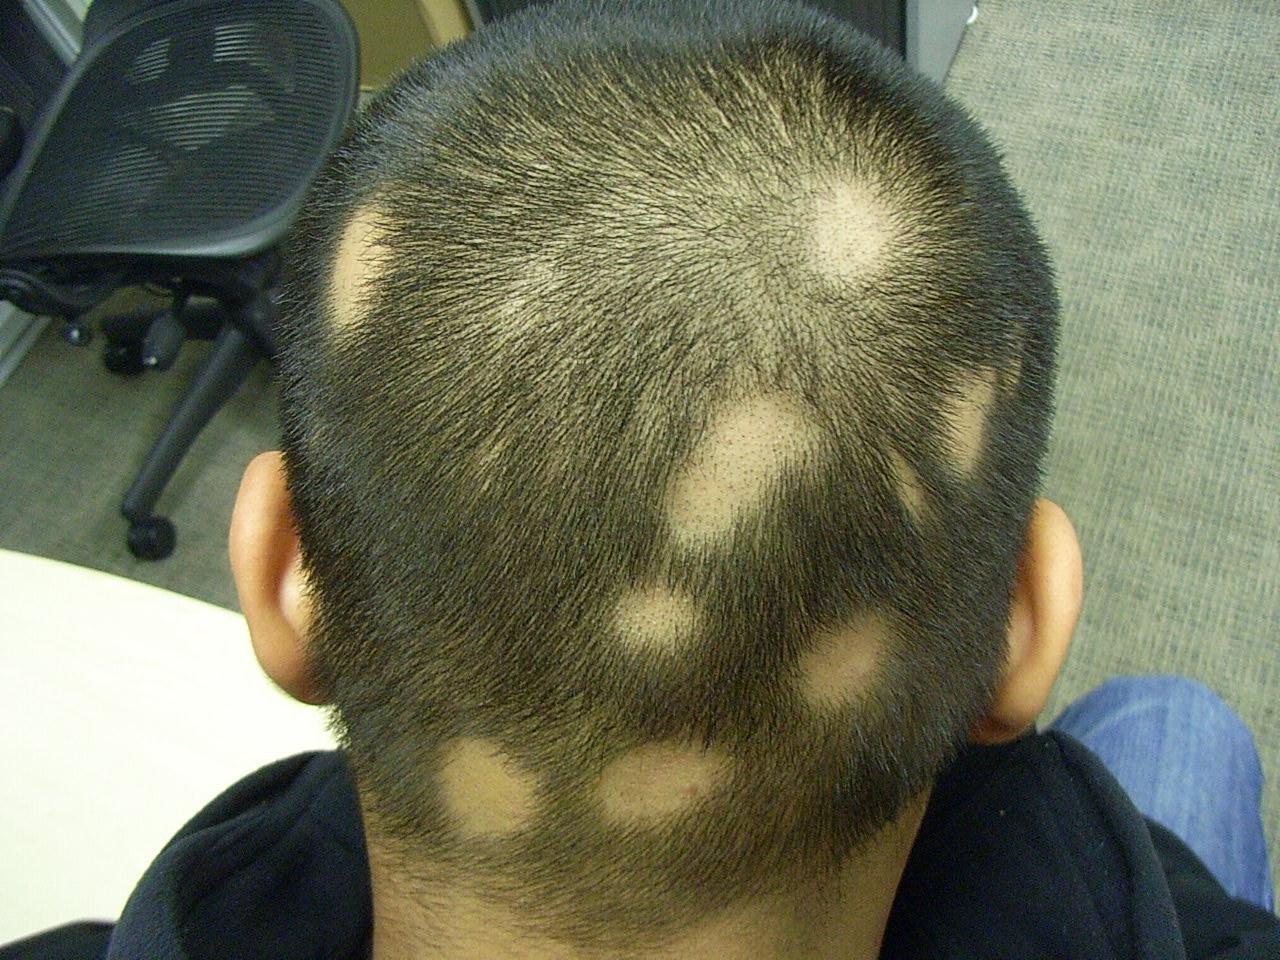 Как лечить алопецию у мужчин на голове